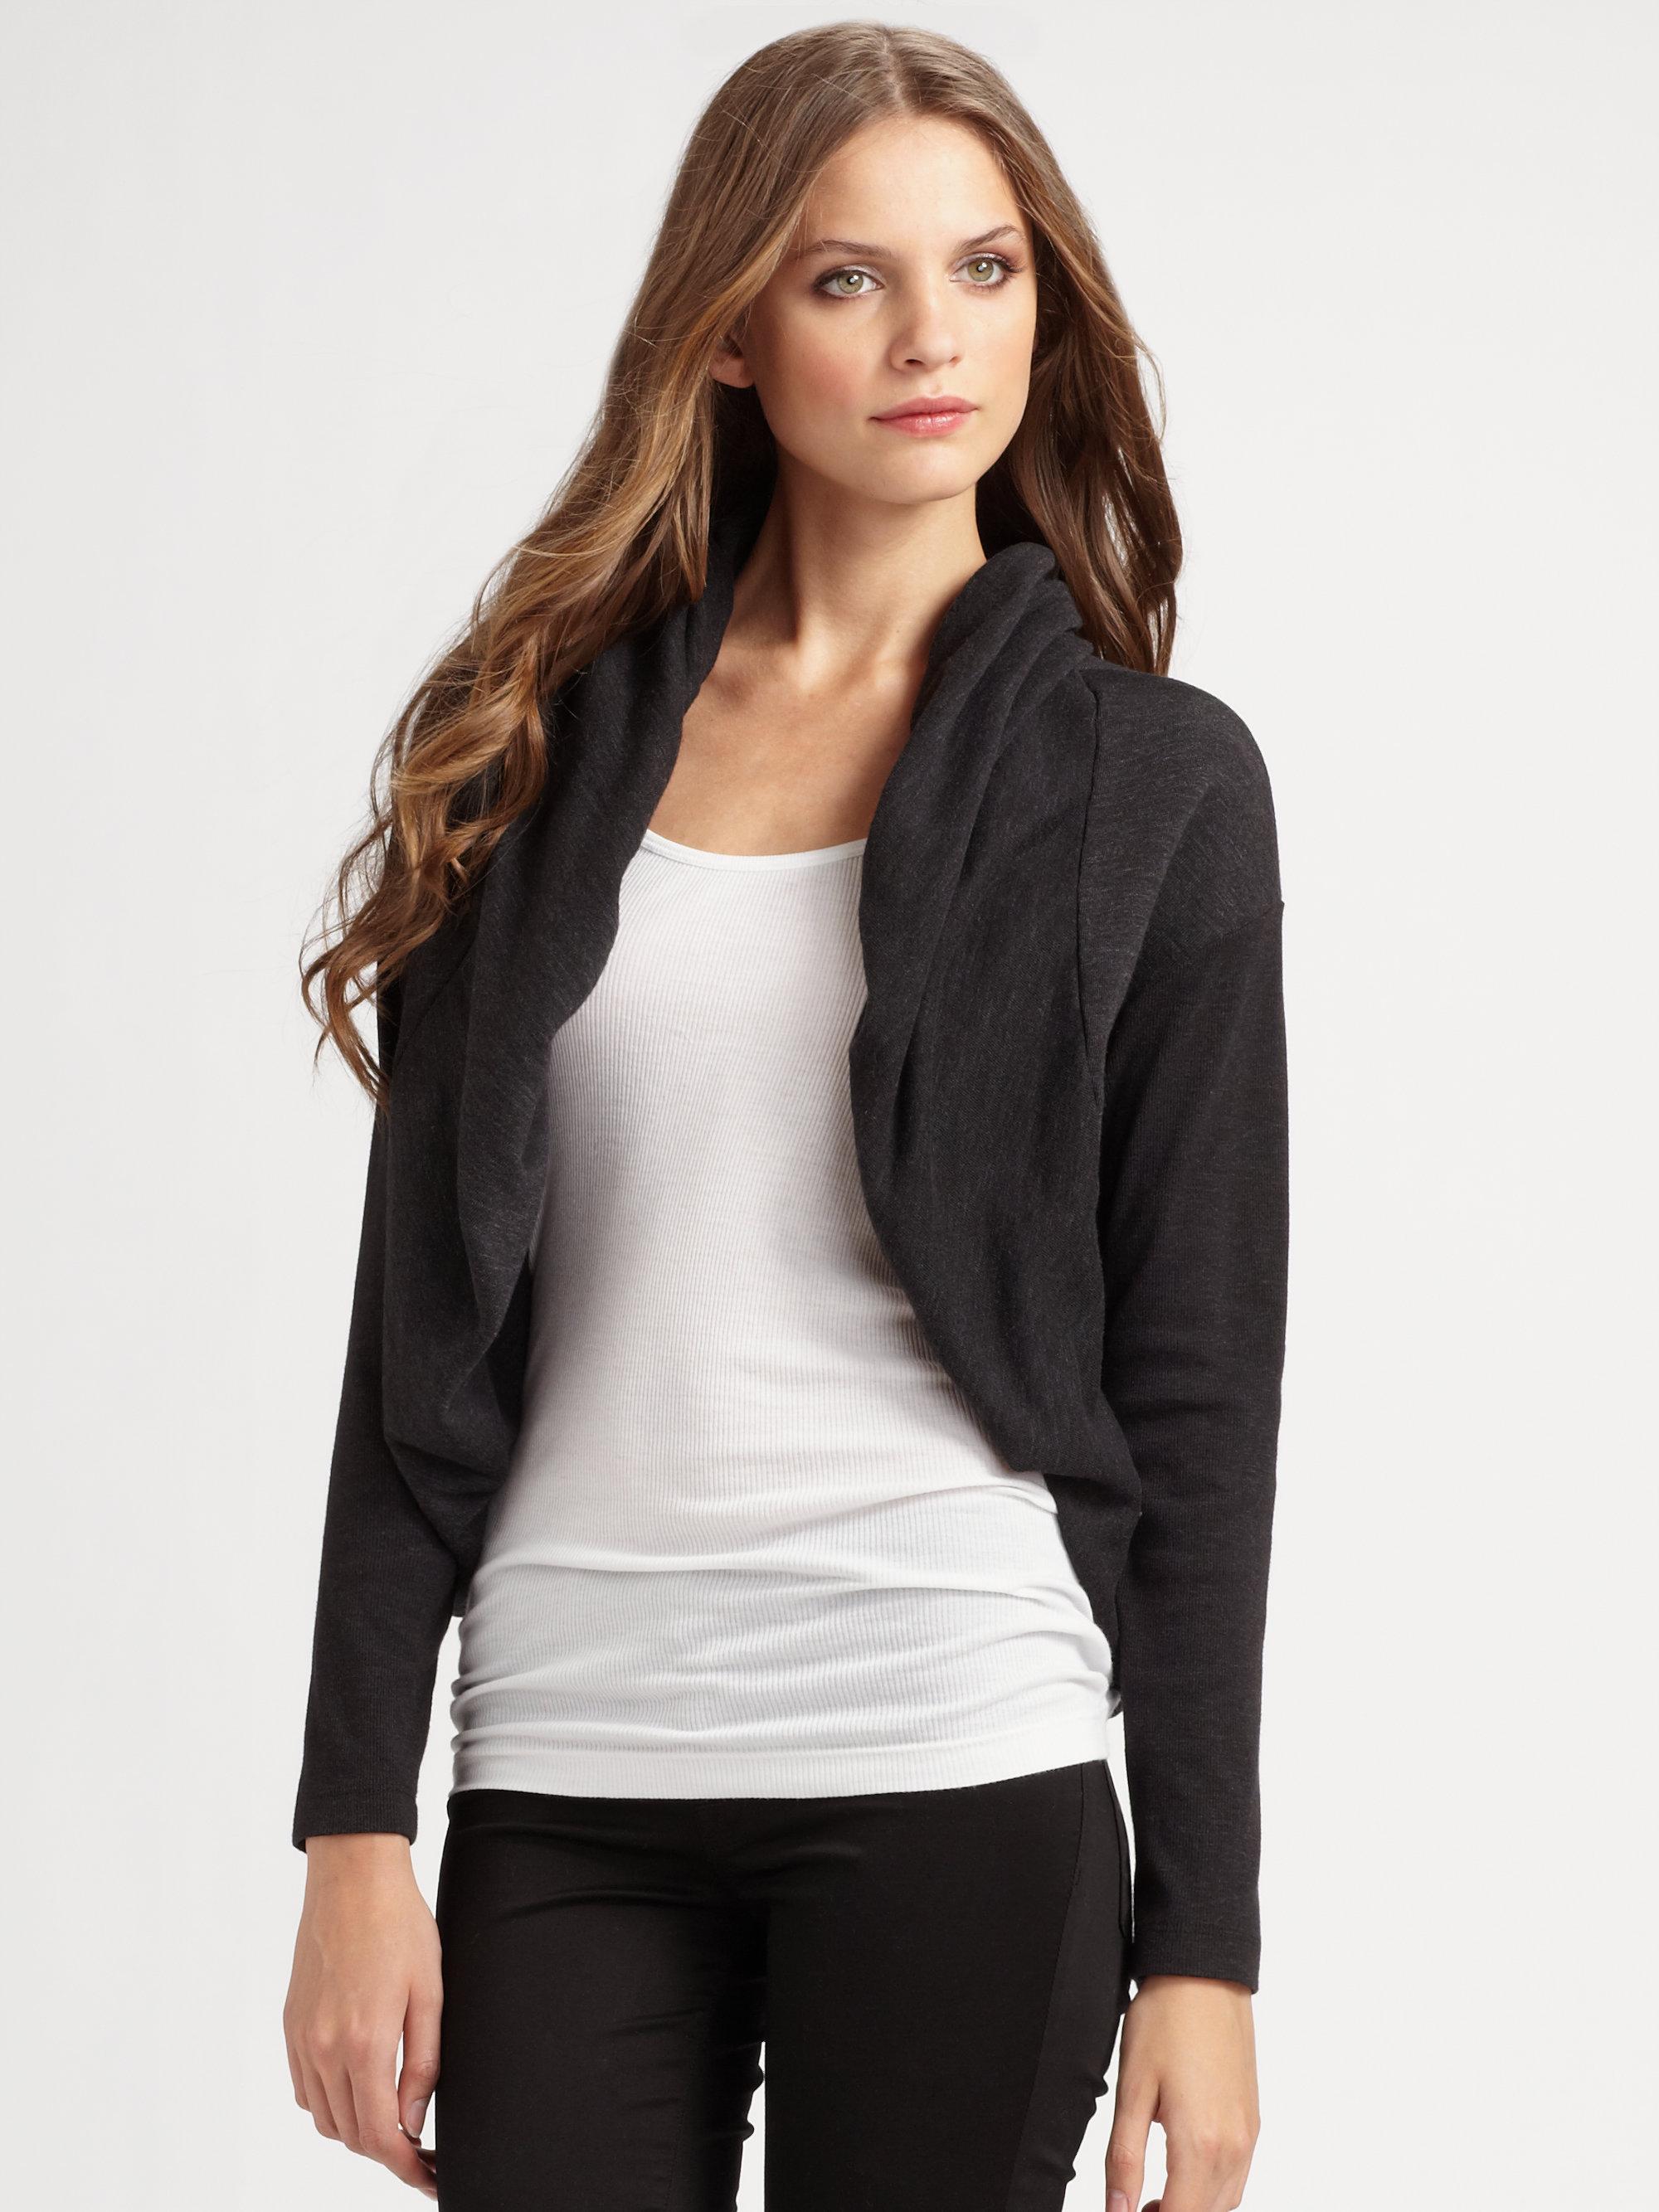 james perse bolero jacket in black lyst. Black Bedroom Furniture Sets. Home Design Ideas